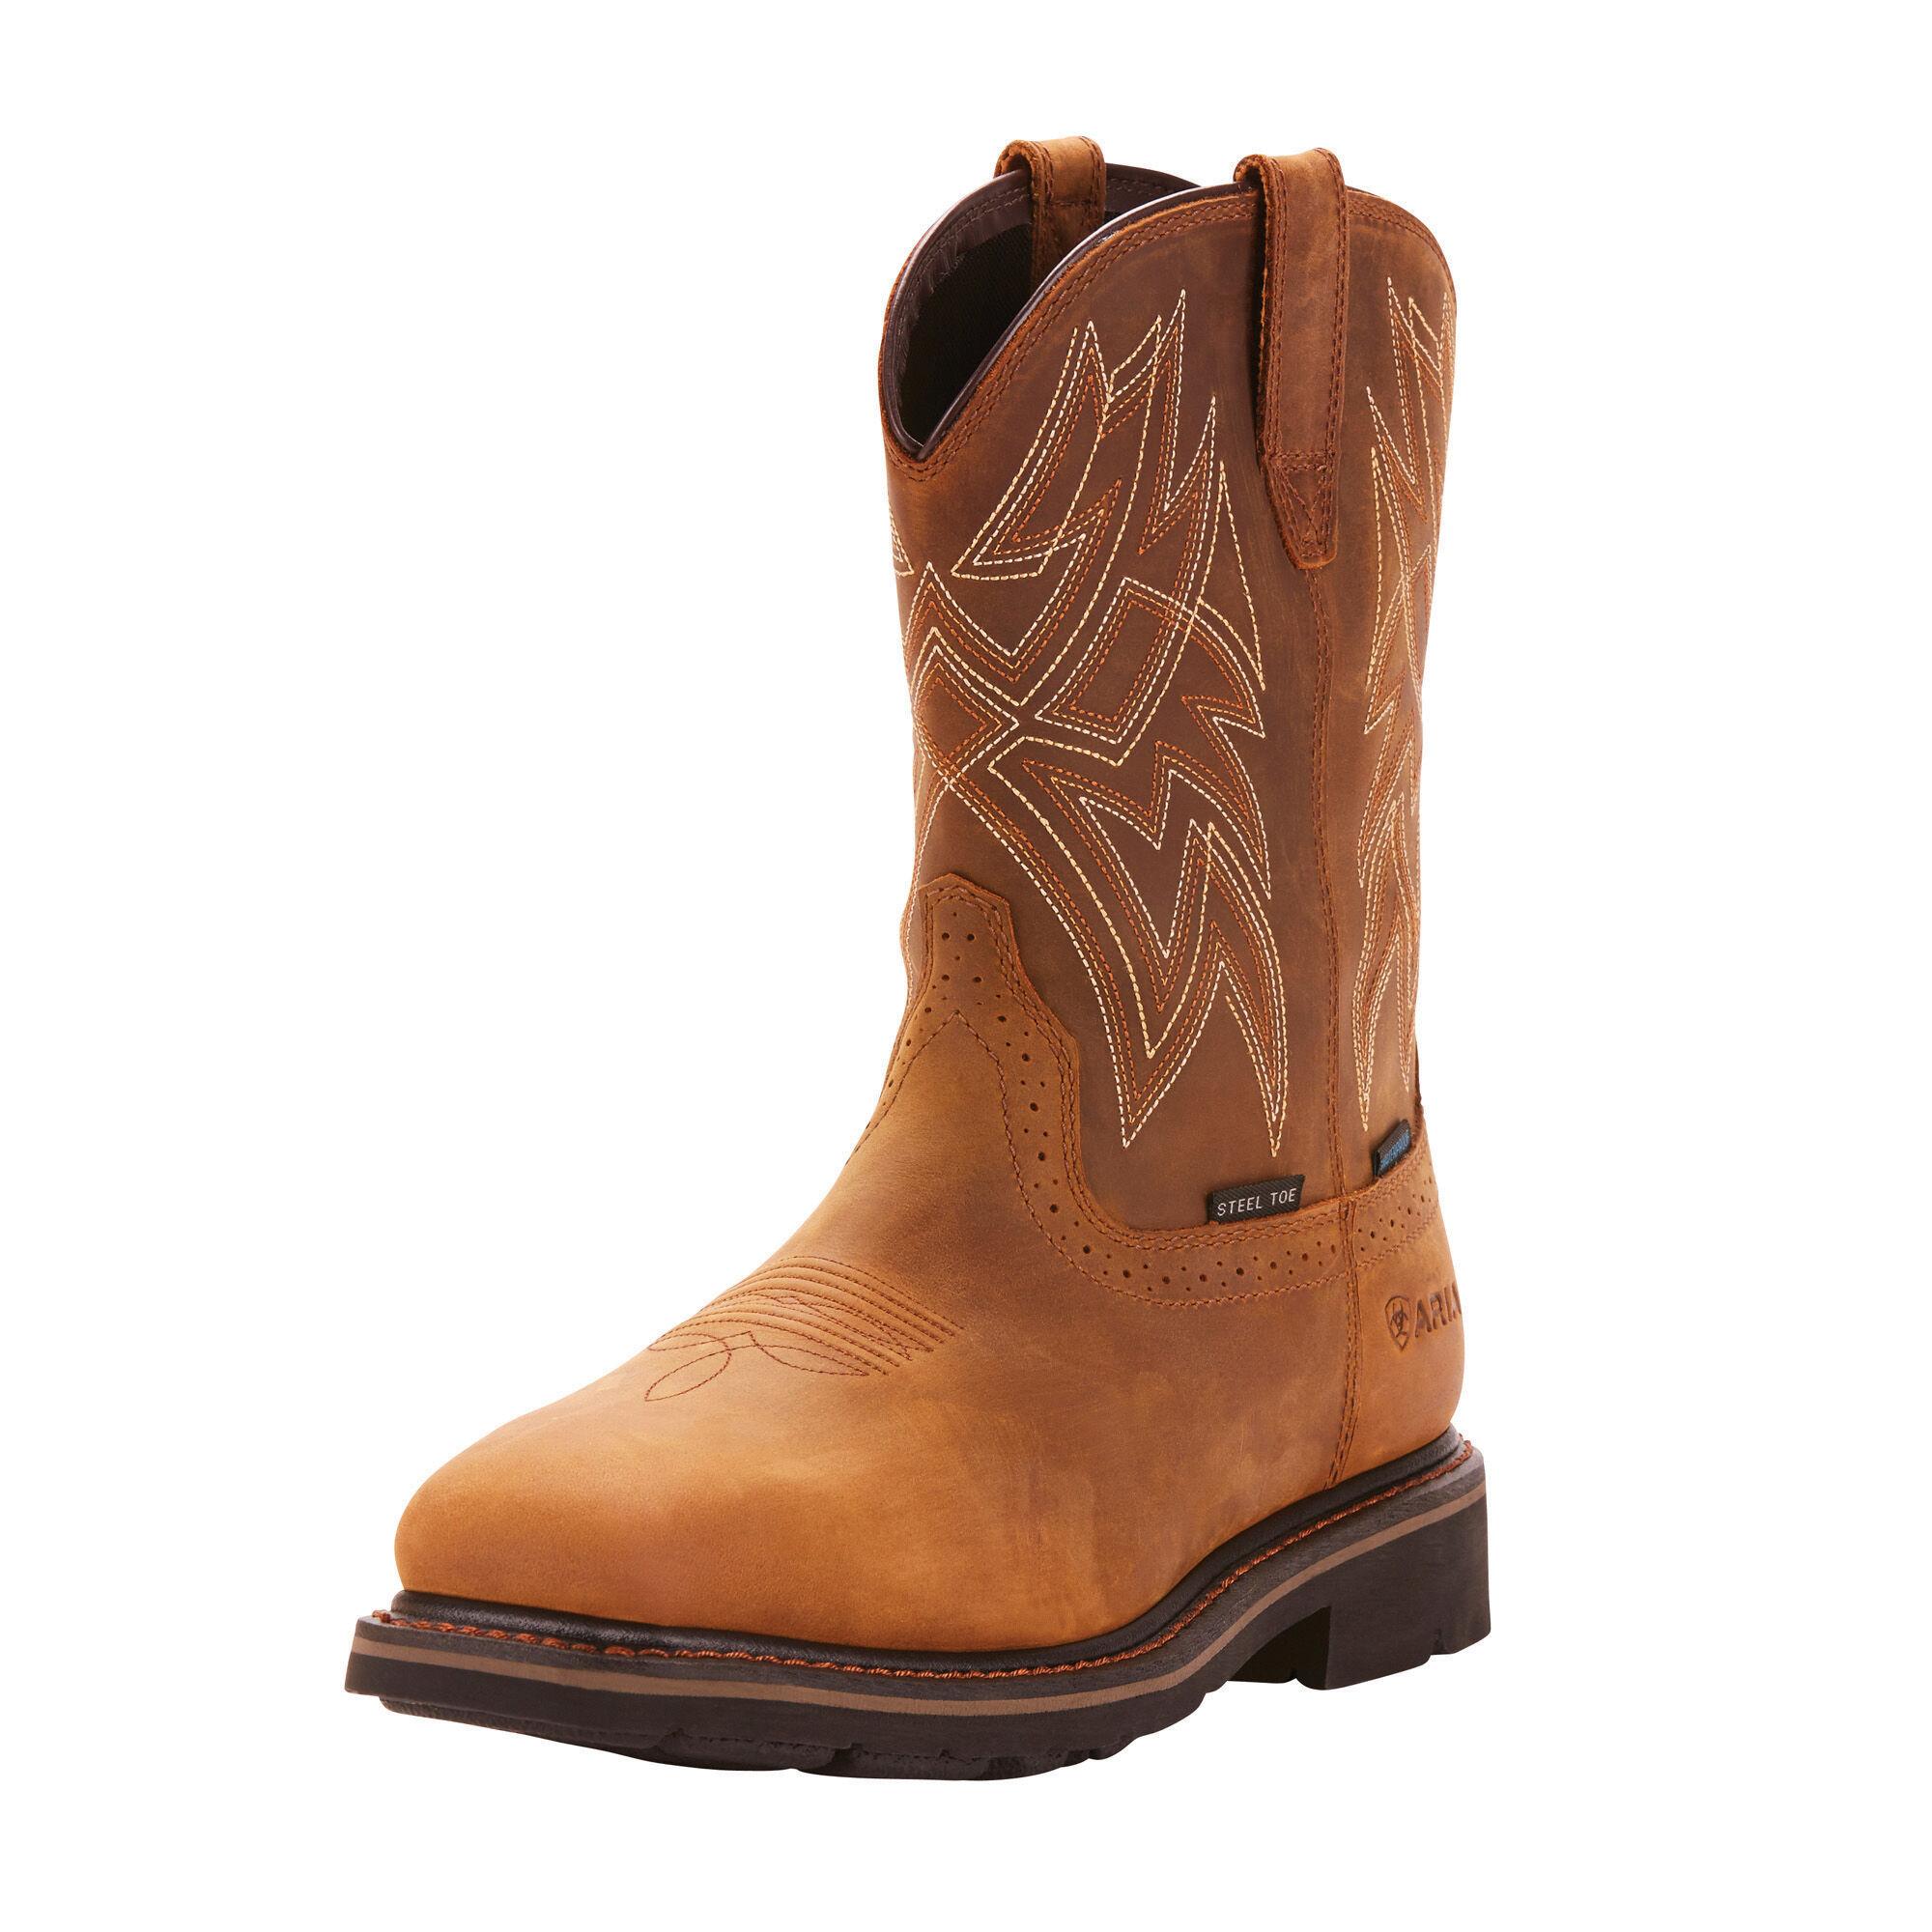 Everett Waterproof Steel Toe Work Boot